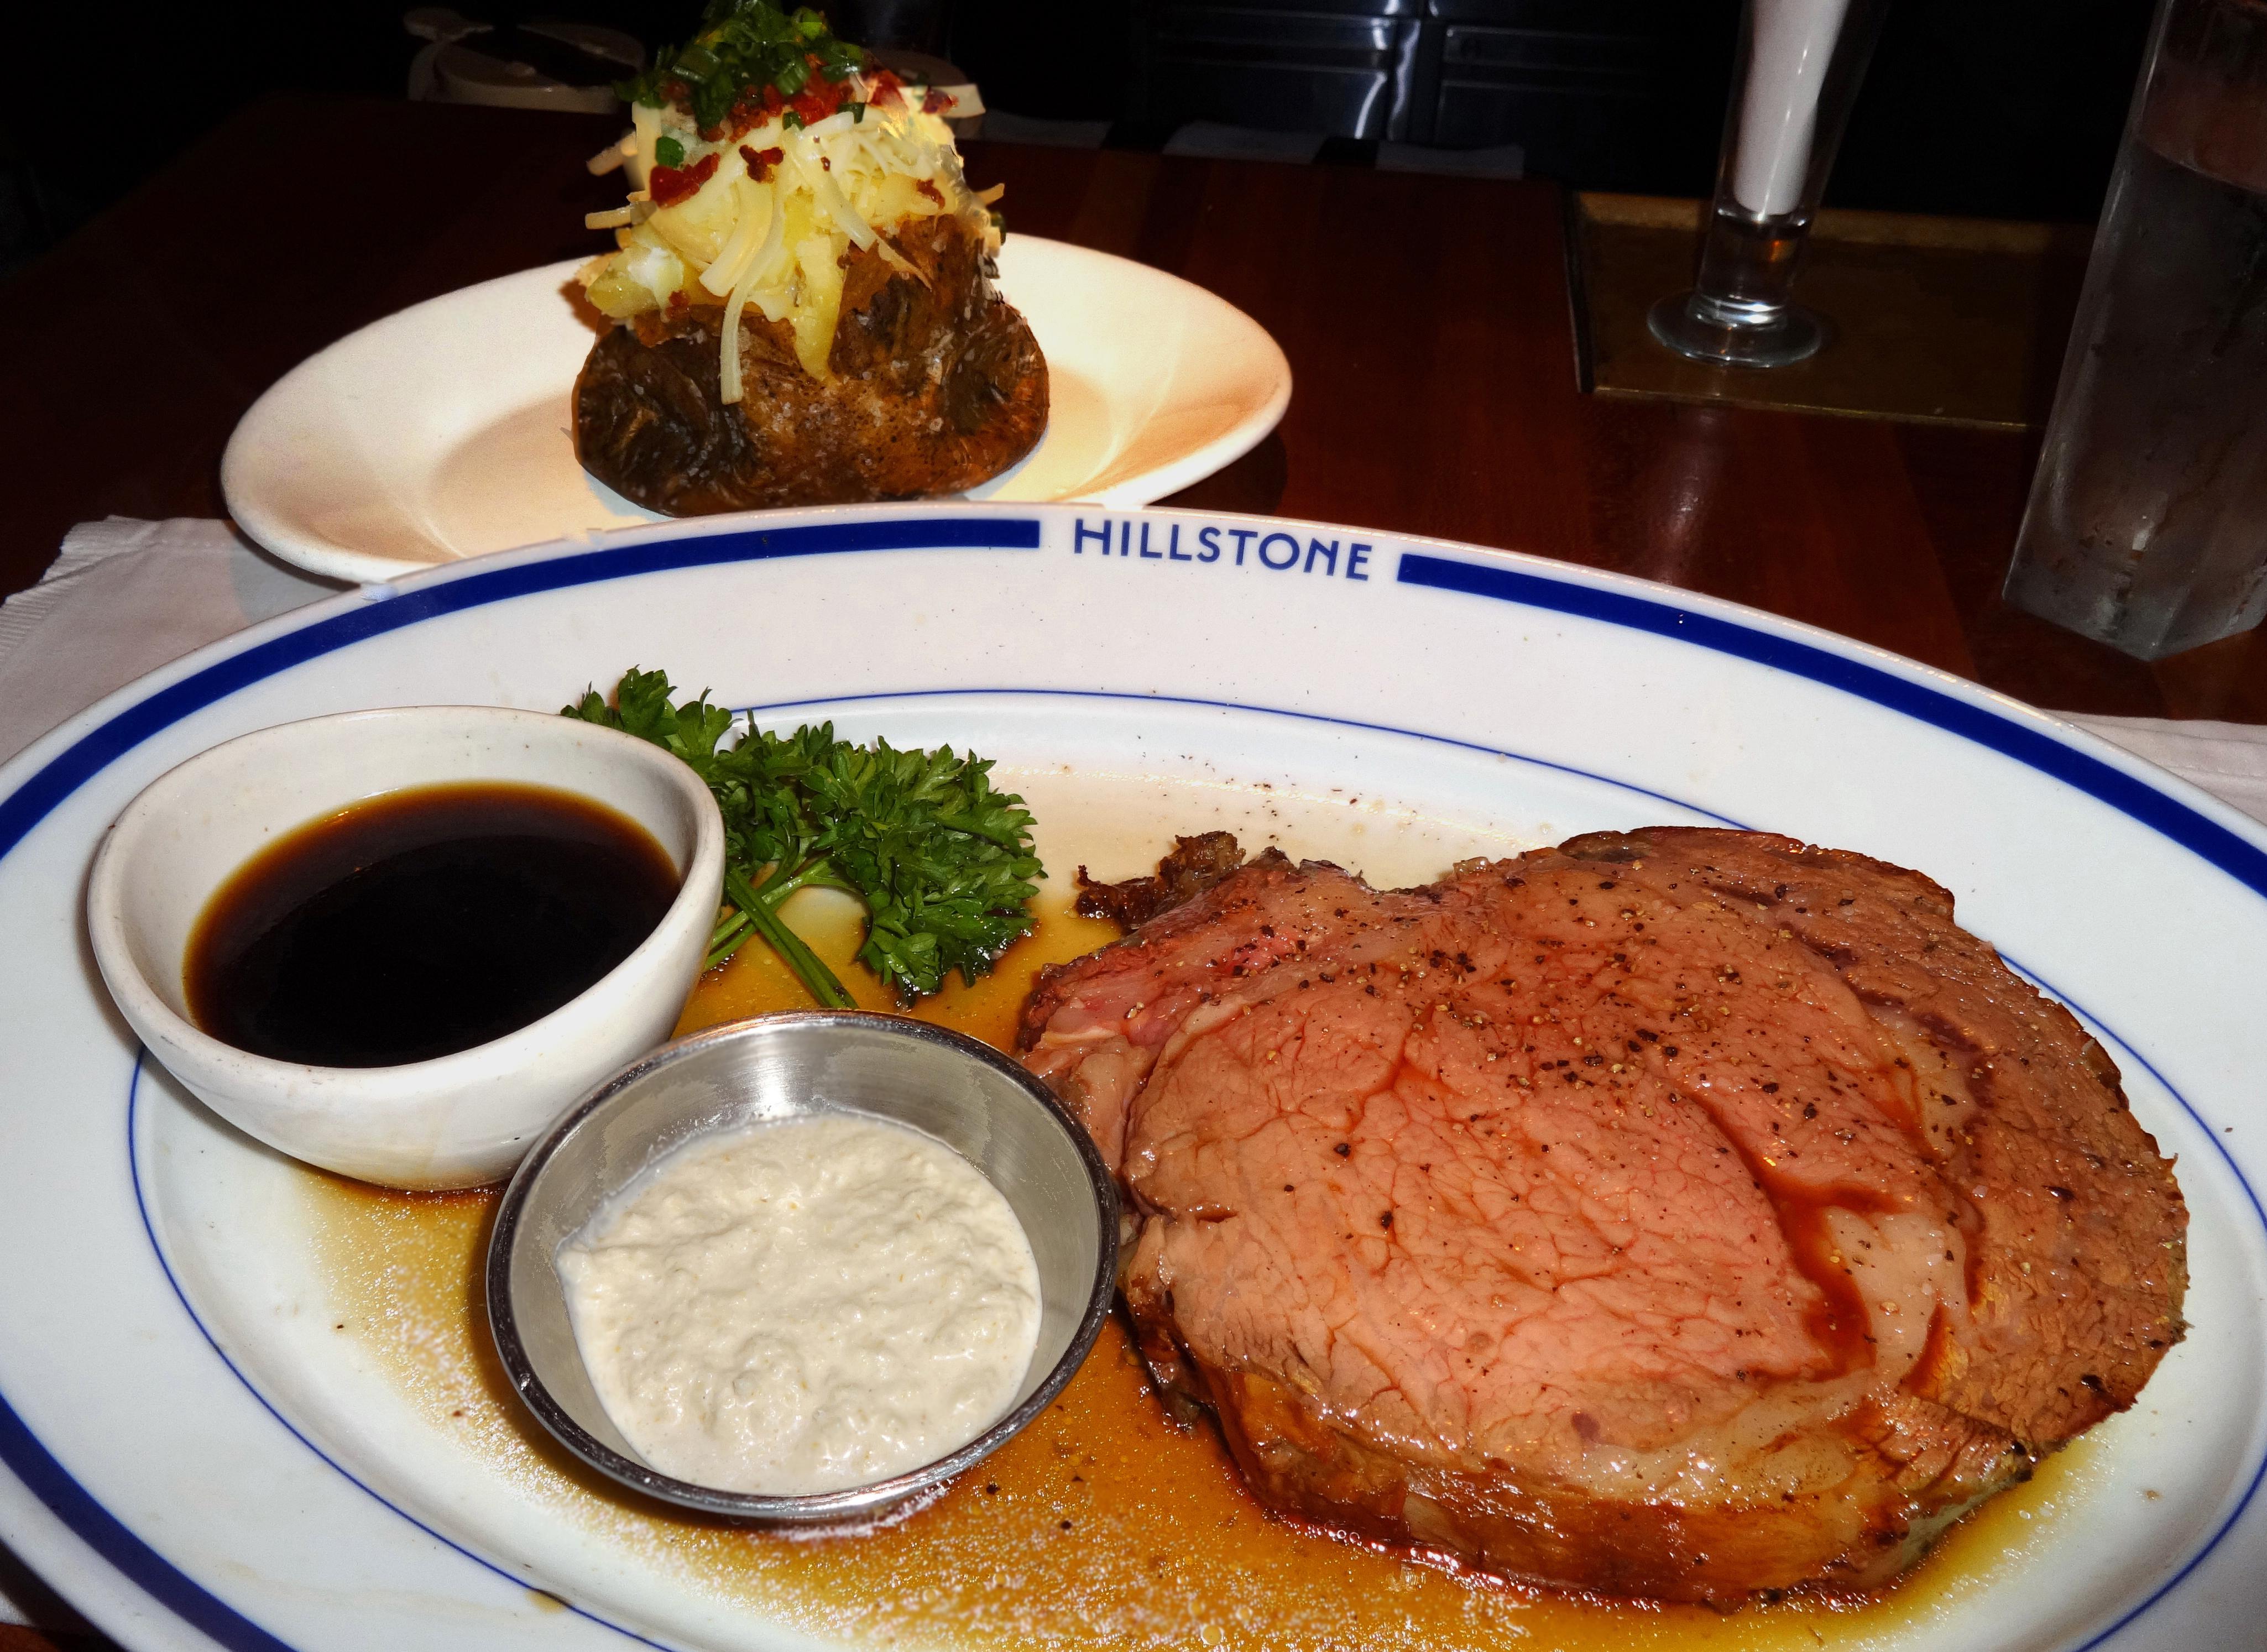 Hillstone prime rib